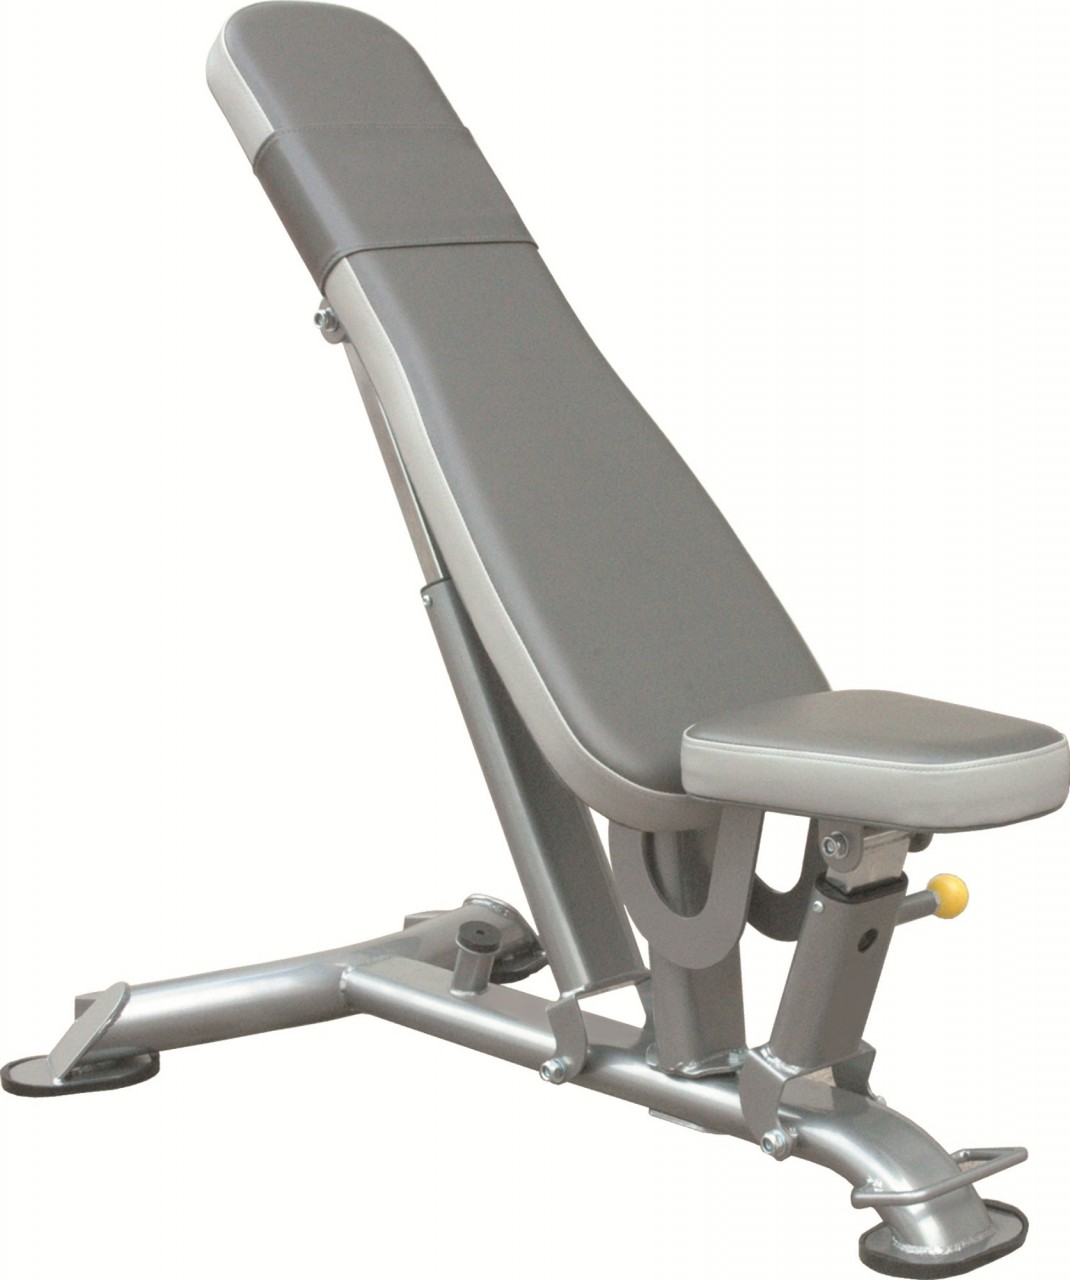 Impulse Multi adjustable bench